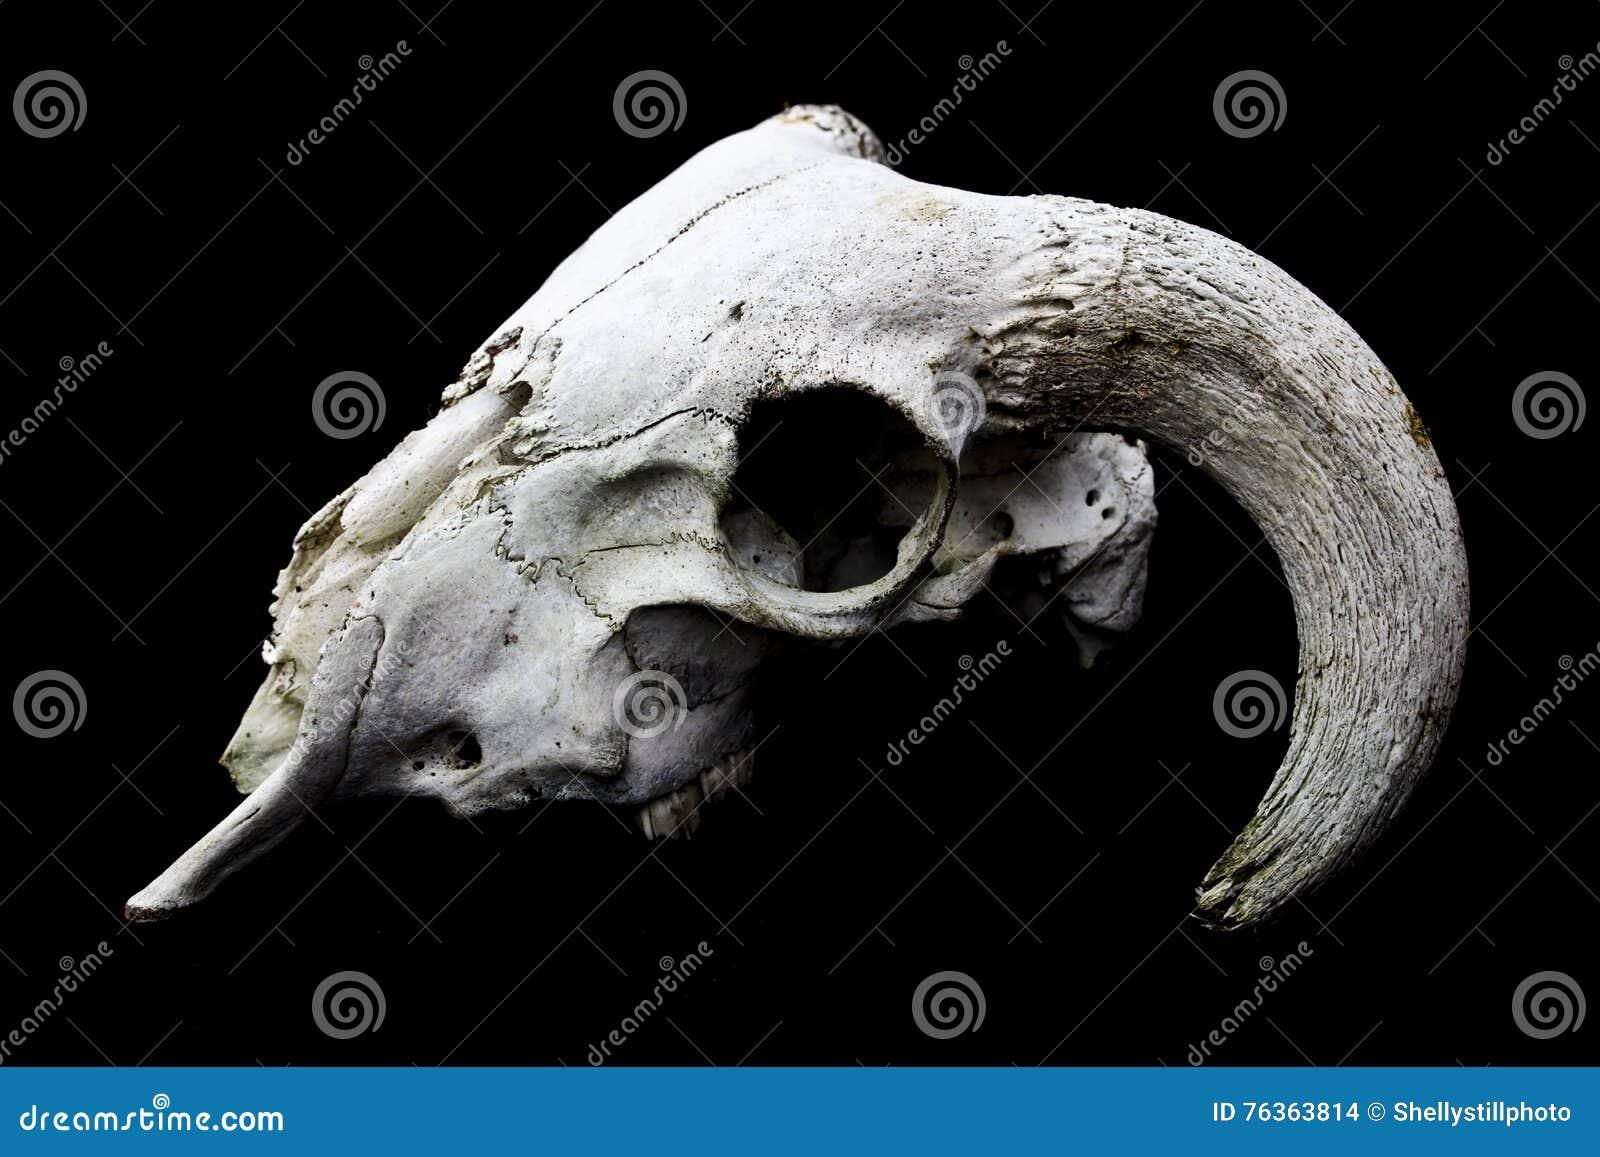 Horned Ram Sheep Skull Head On Black Background Stock Photo - Image ...